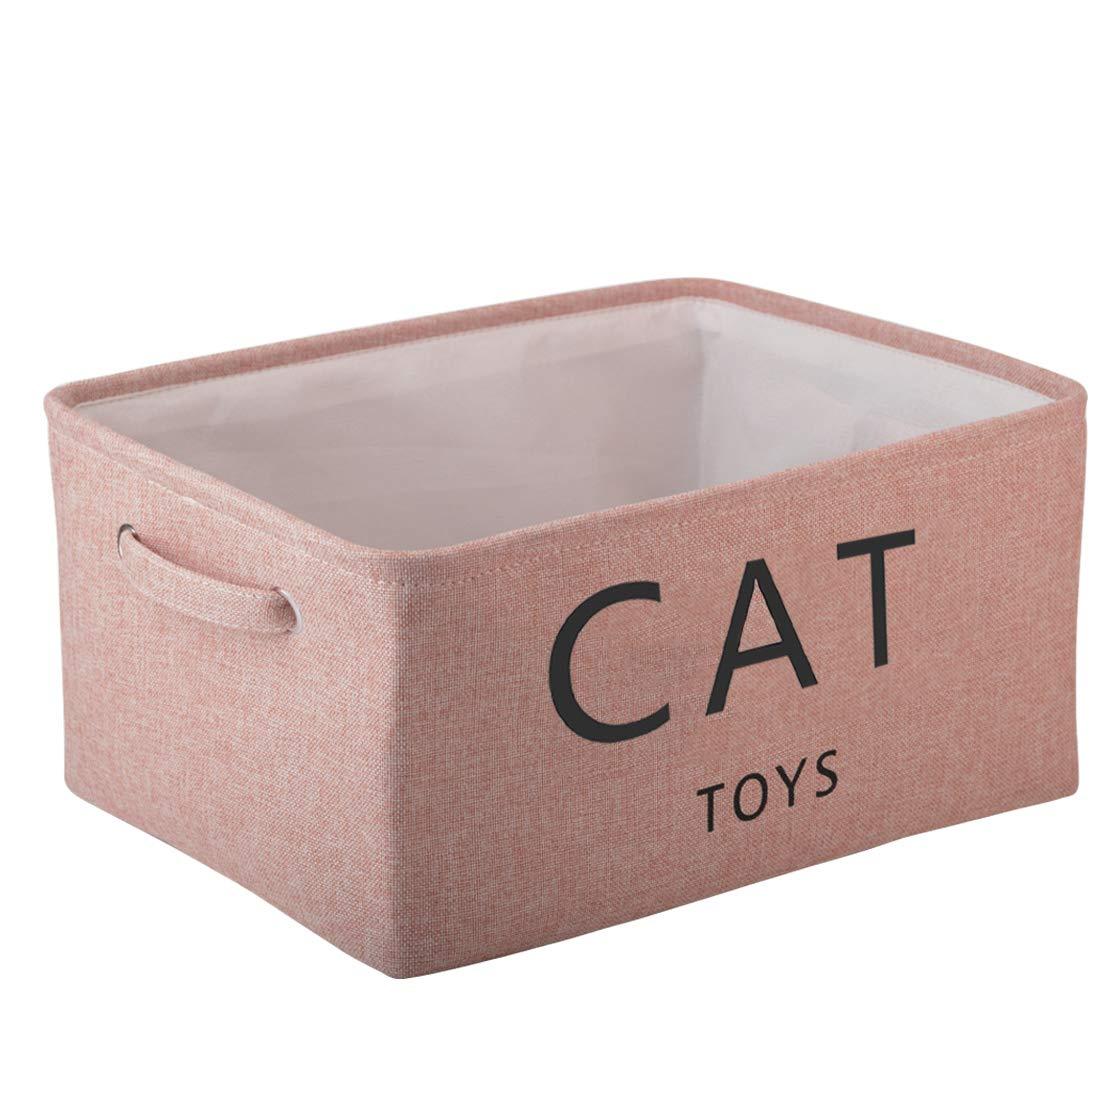 Morezi Canvas Storage Basket Bin Chest Organizer - Perfect for Organizing Toy Storage, Baby Toys, Kids Toys, Dog Toys, Baby Clothing, Children Books, Gift Baskets - Cat Toy - Pink